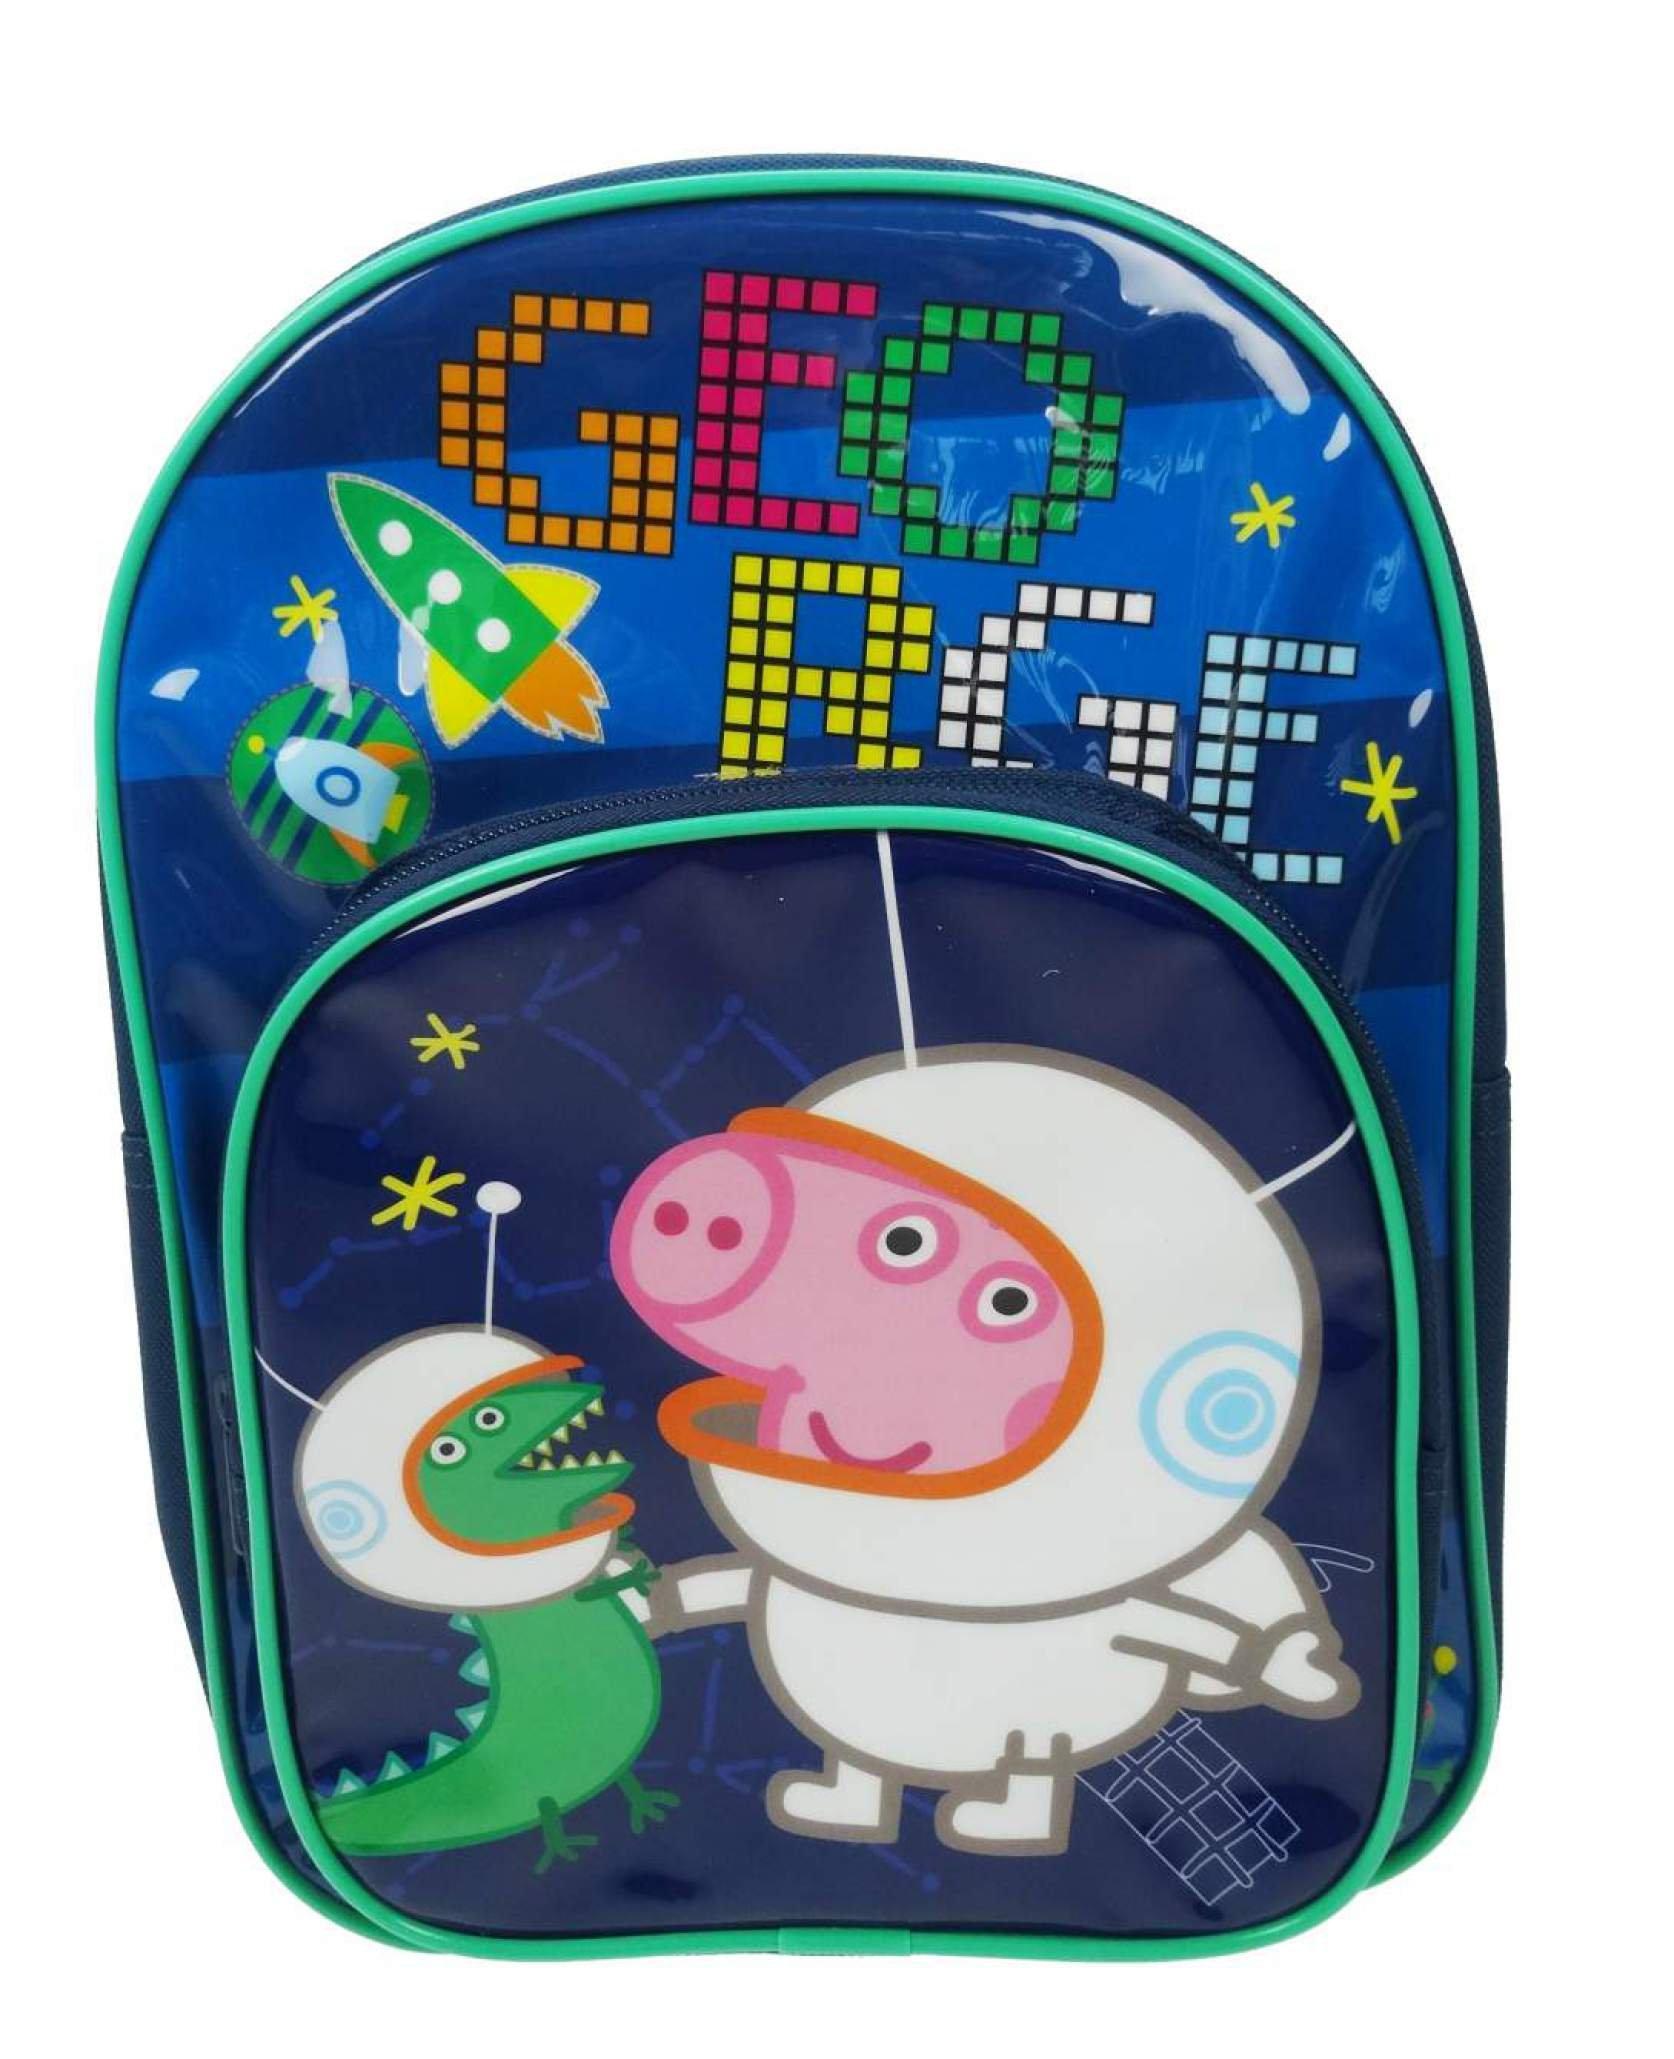 81TpgEdU1uL - Peppa Pig PEPPA001320 - Mochila infantil, 10 litros, color azul marino